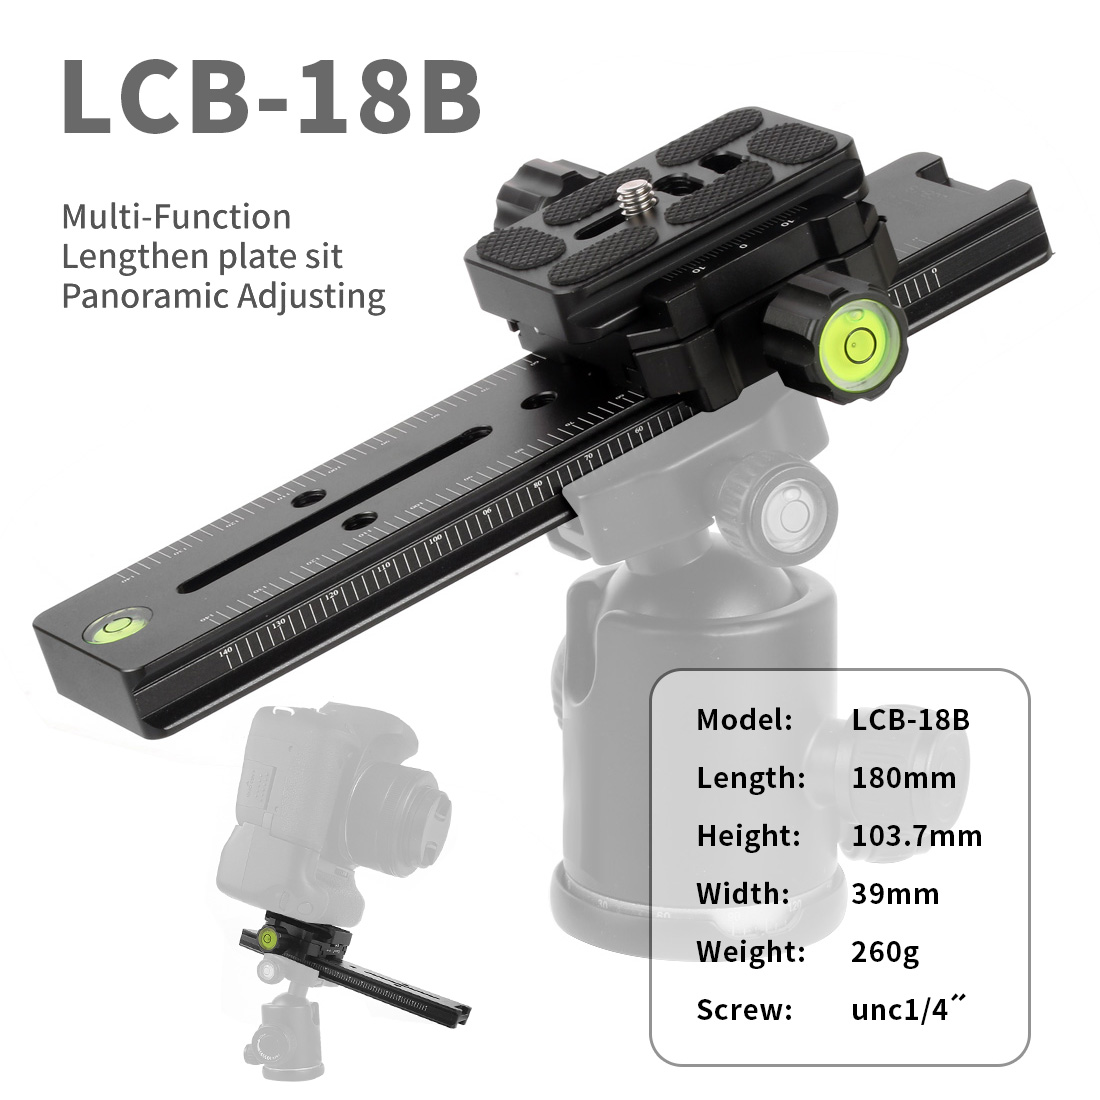 XILETU LCB-18B Track Dolly Slider Focusing Rail Slider & Clamp Focus QR Plate Meet Arca Swiss 1/4 Screw For Canon DSLR Camera